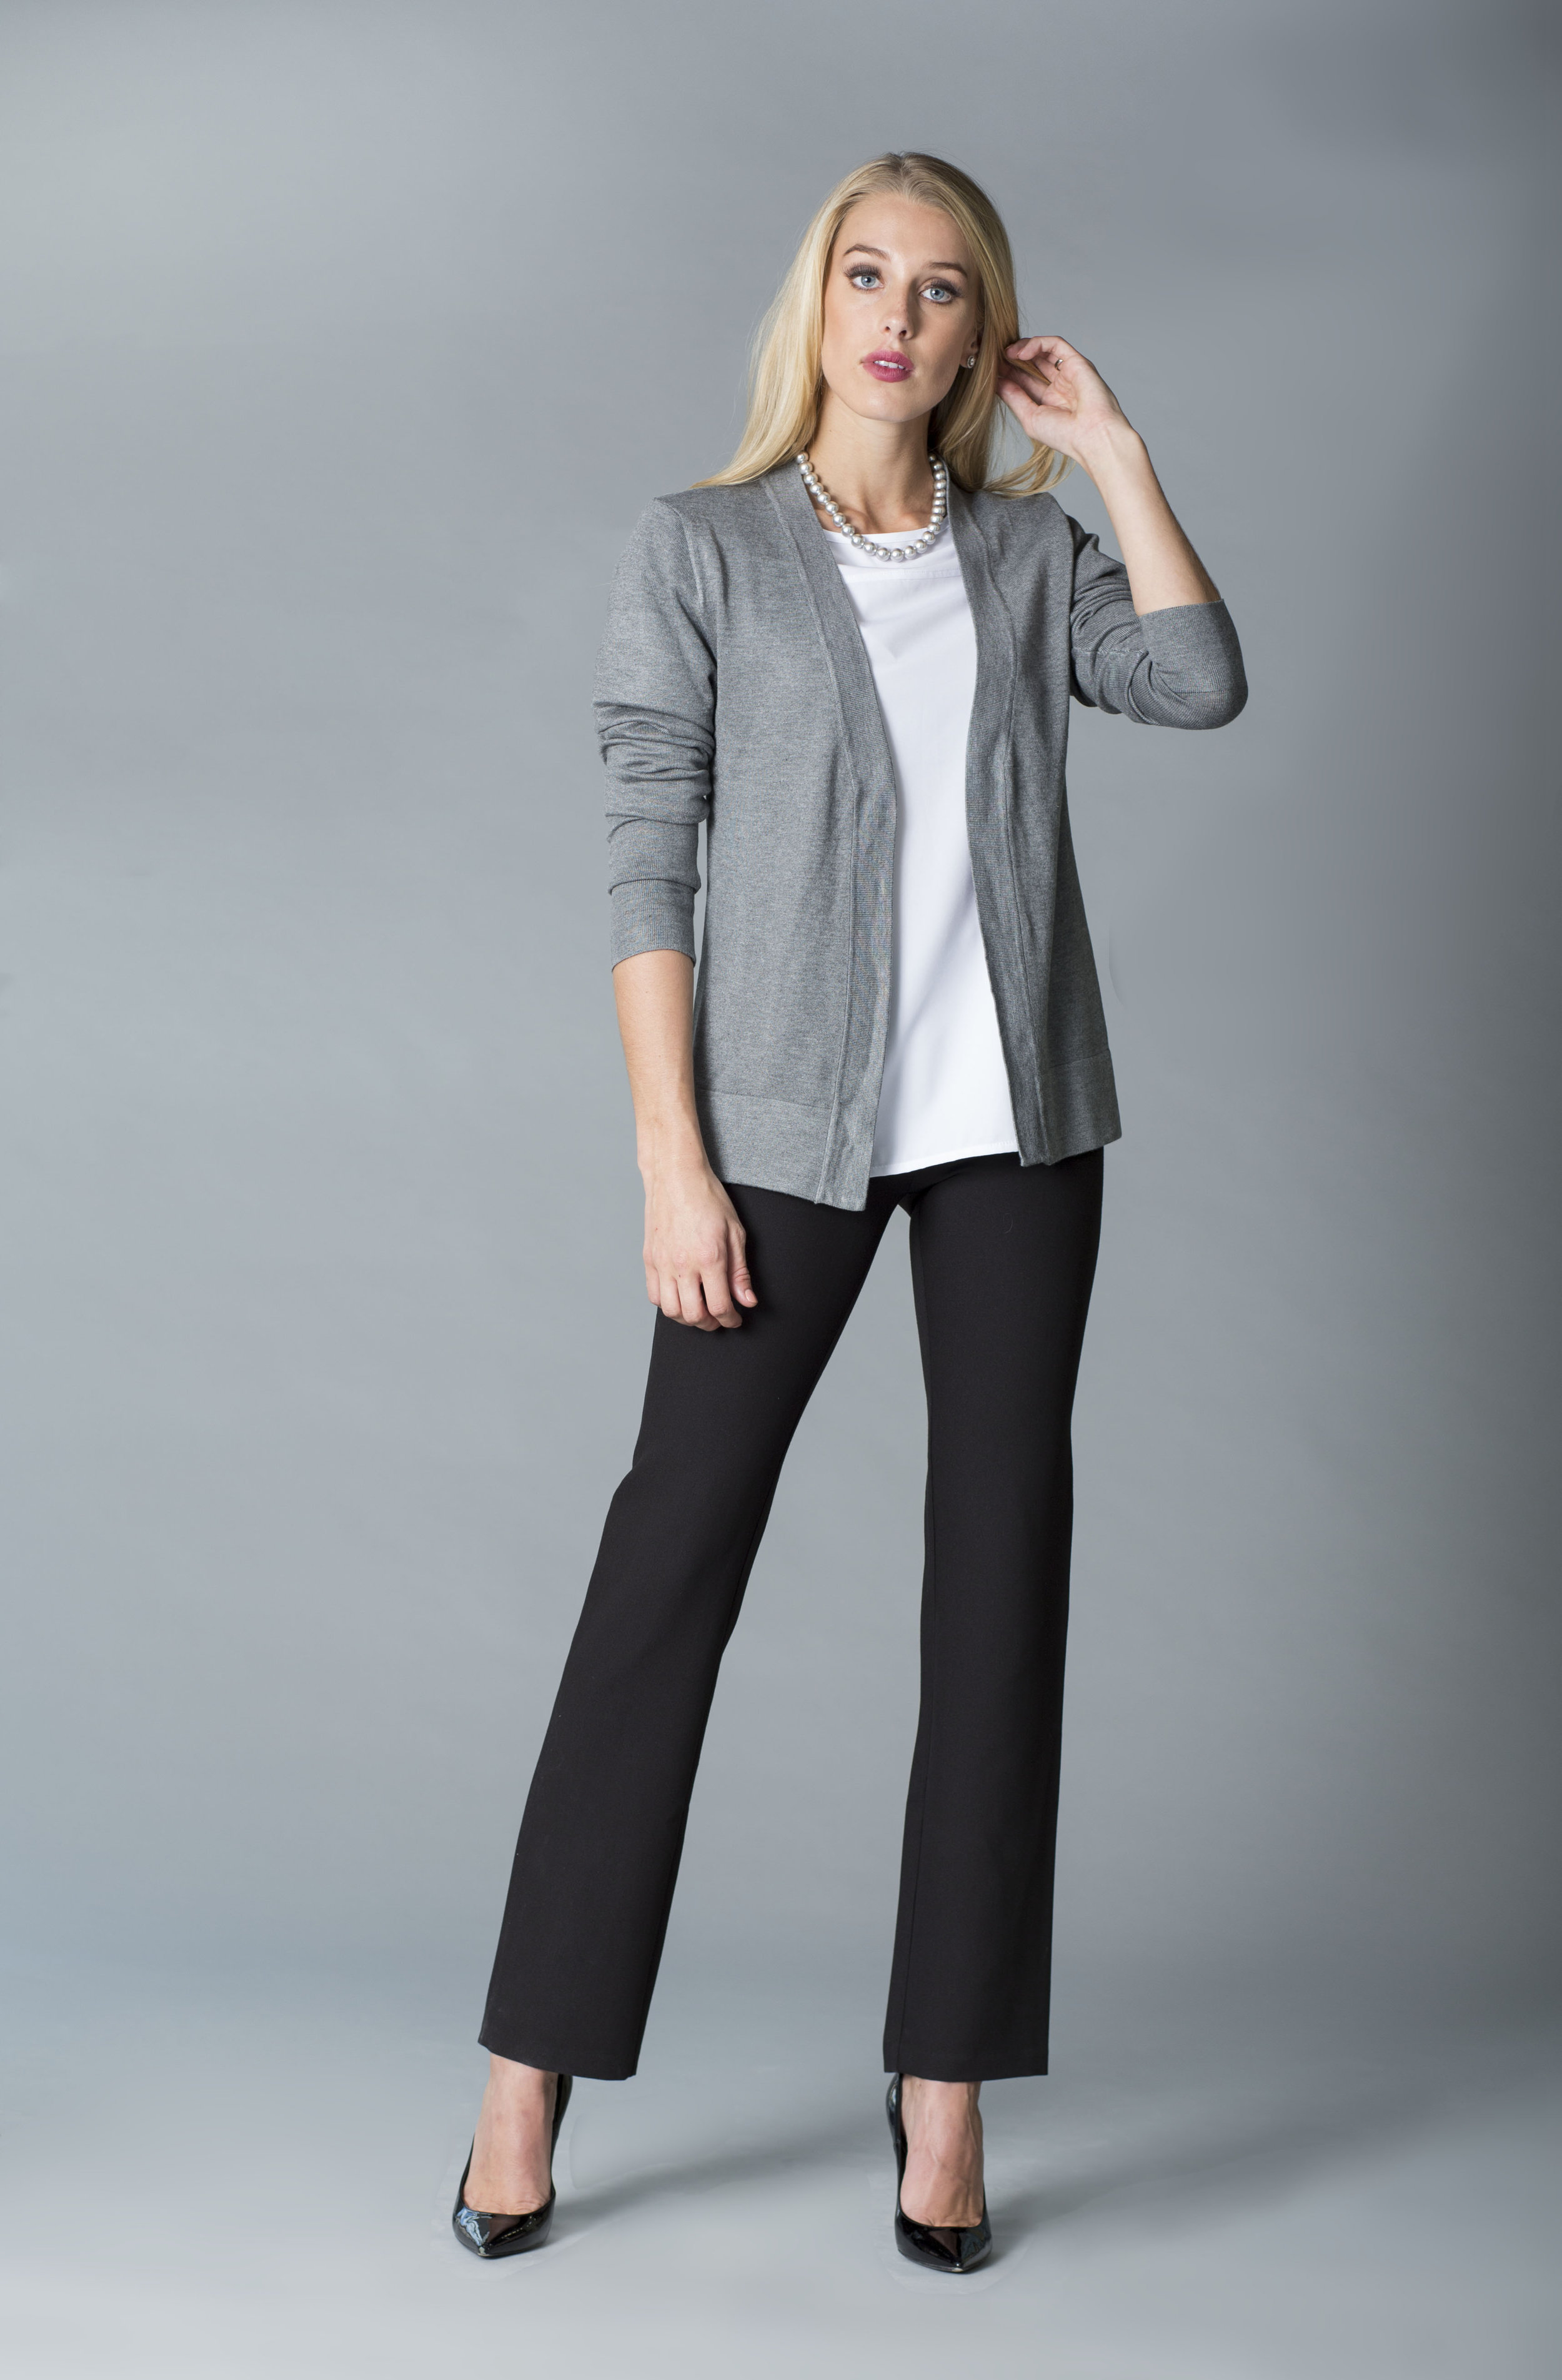 MDSN 659 blanca- pant negro-cardigan gris copy.jpg